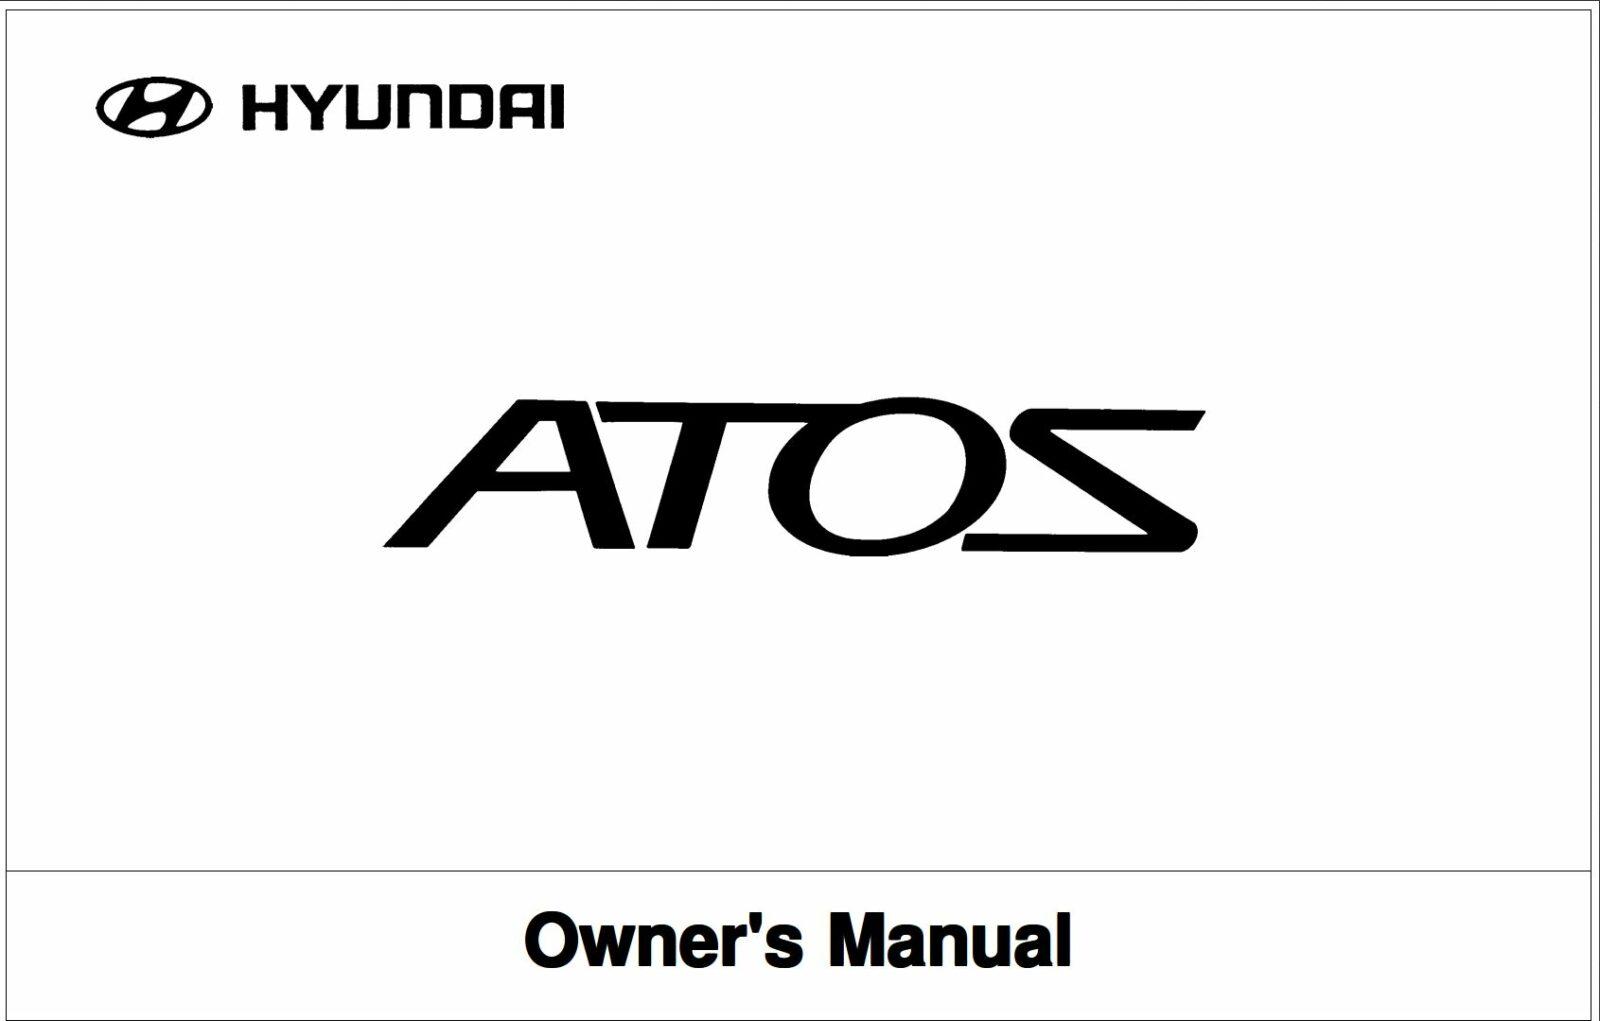 Hyundai Atos 2002 Owner's Manual